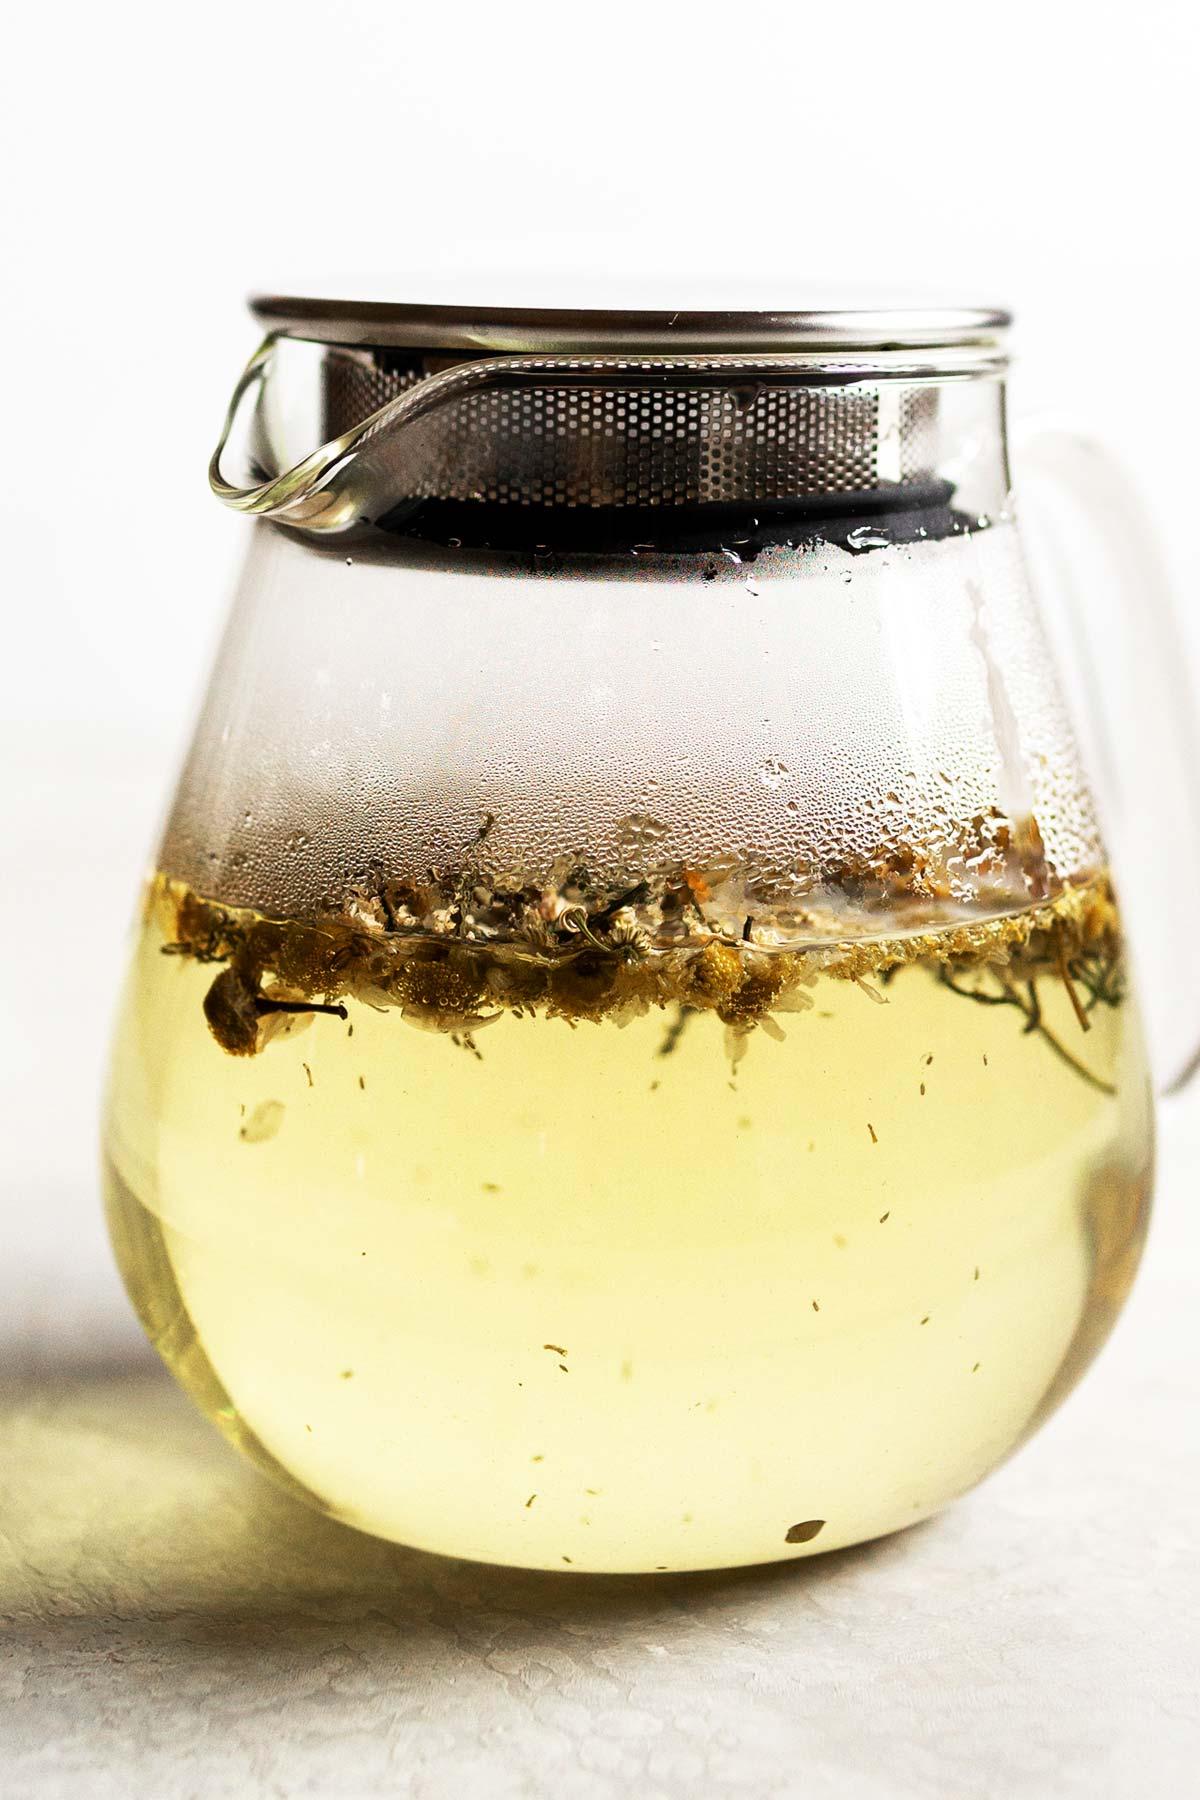 Chamomile tea steeping in a teapot.